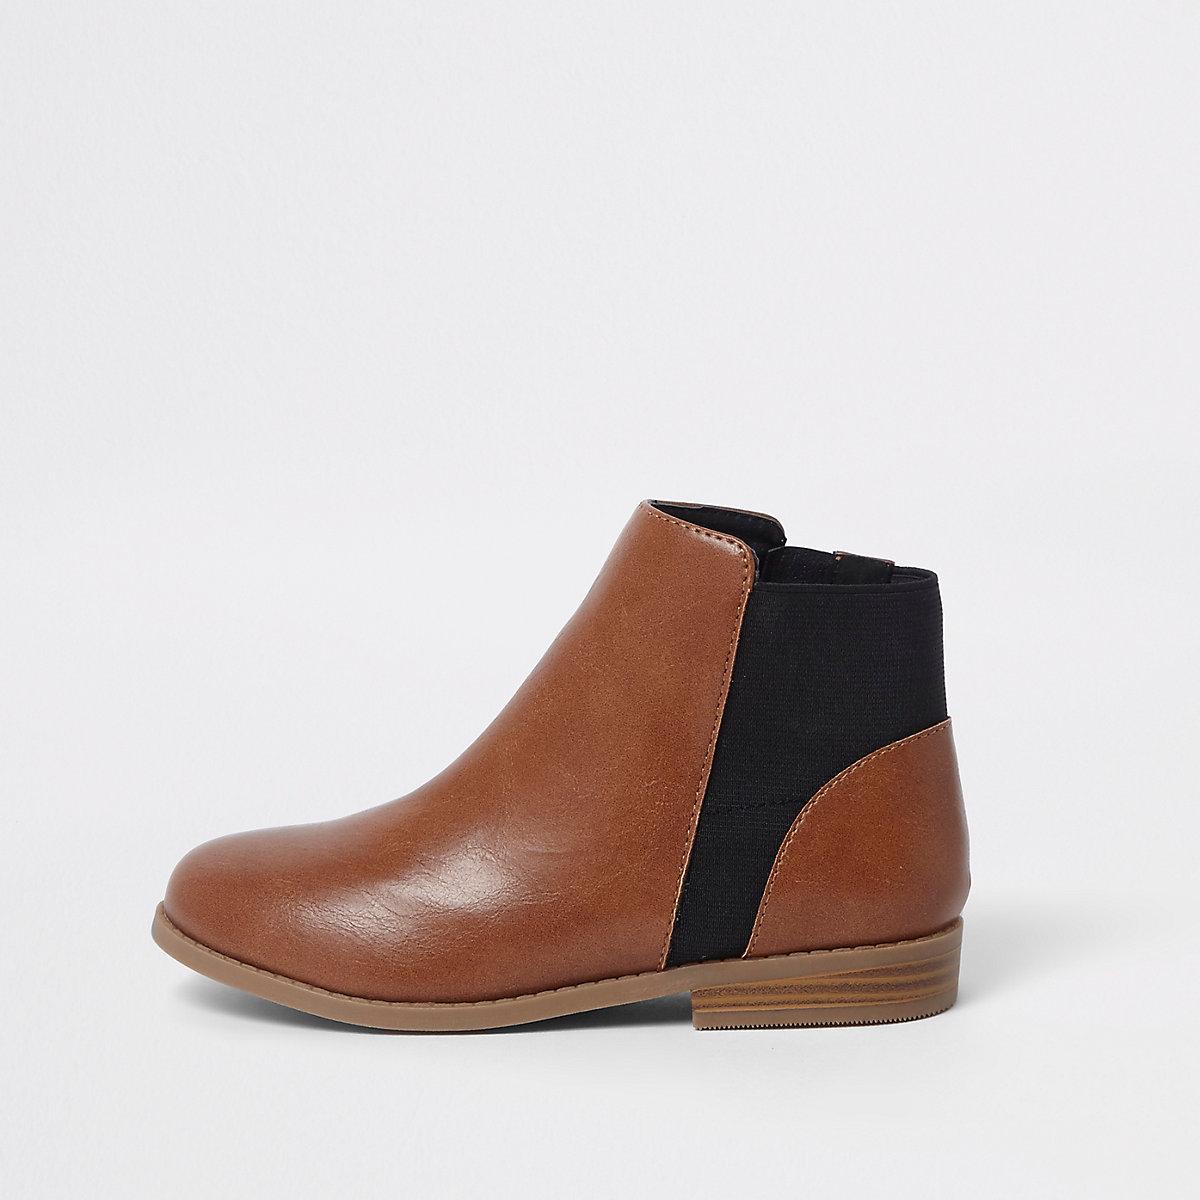 Girls tan chelsea boots